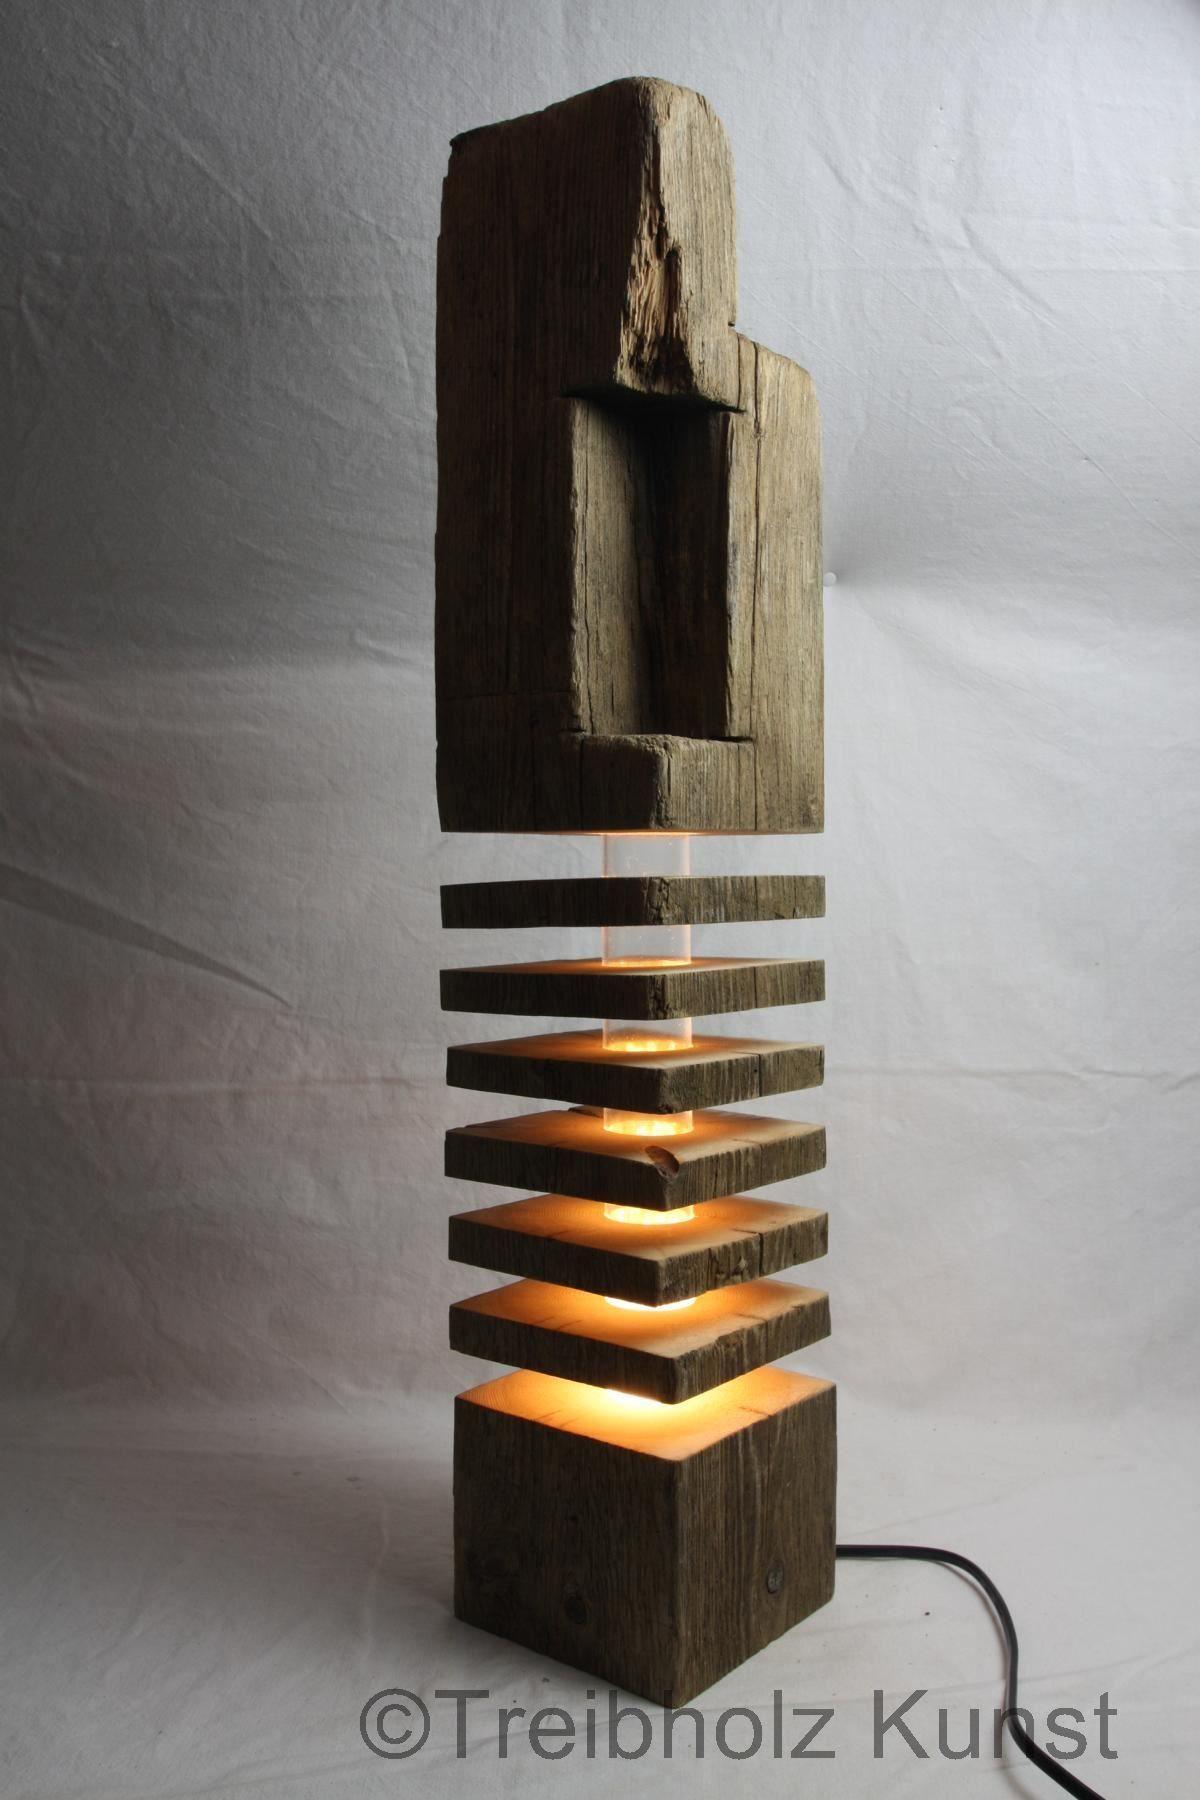 Driftwood Old Wood Design Lampe Www Treibholz Bod Designer Lampe Indirekt Design Lampen Altholz Design Stehlampe Treibholz